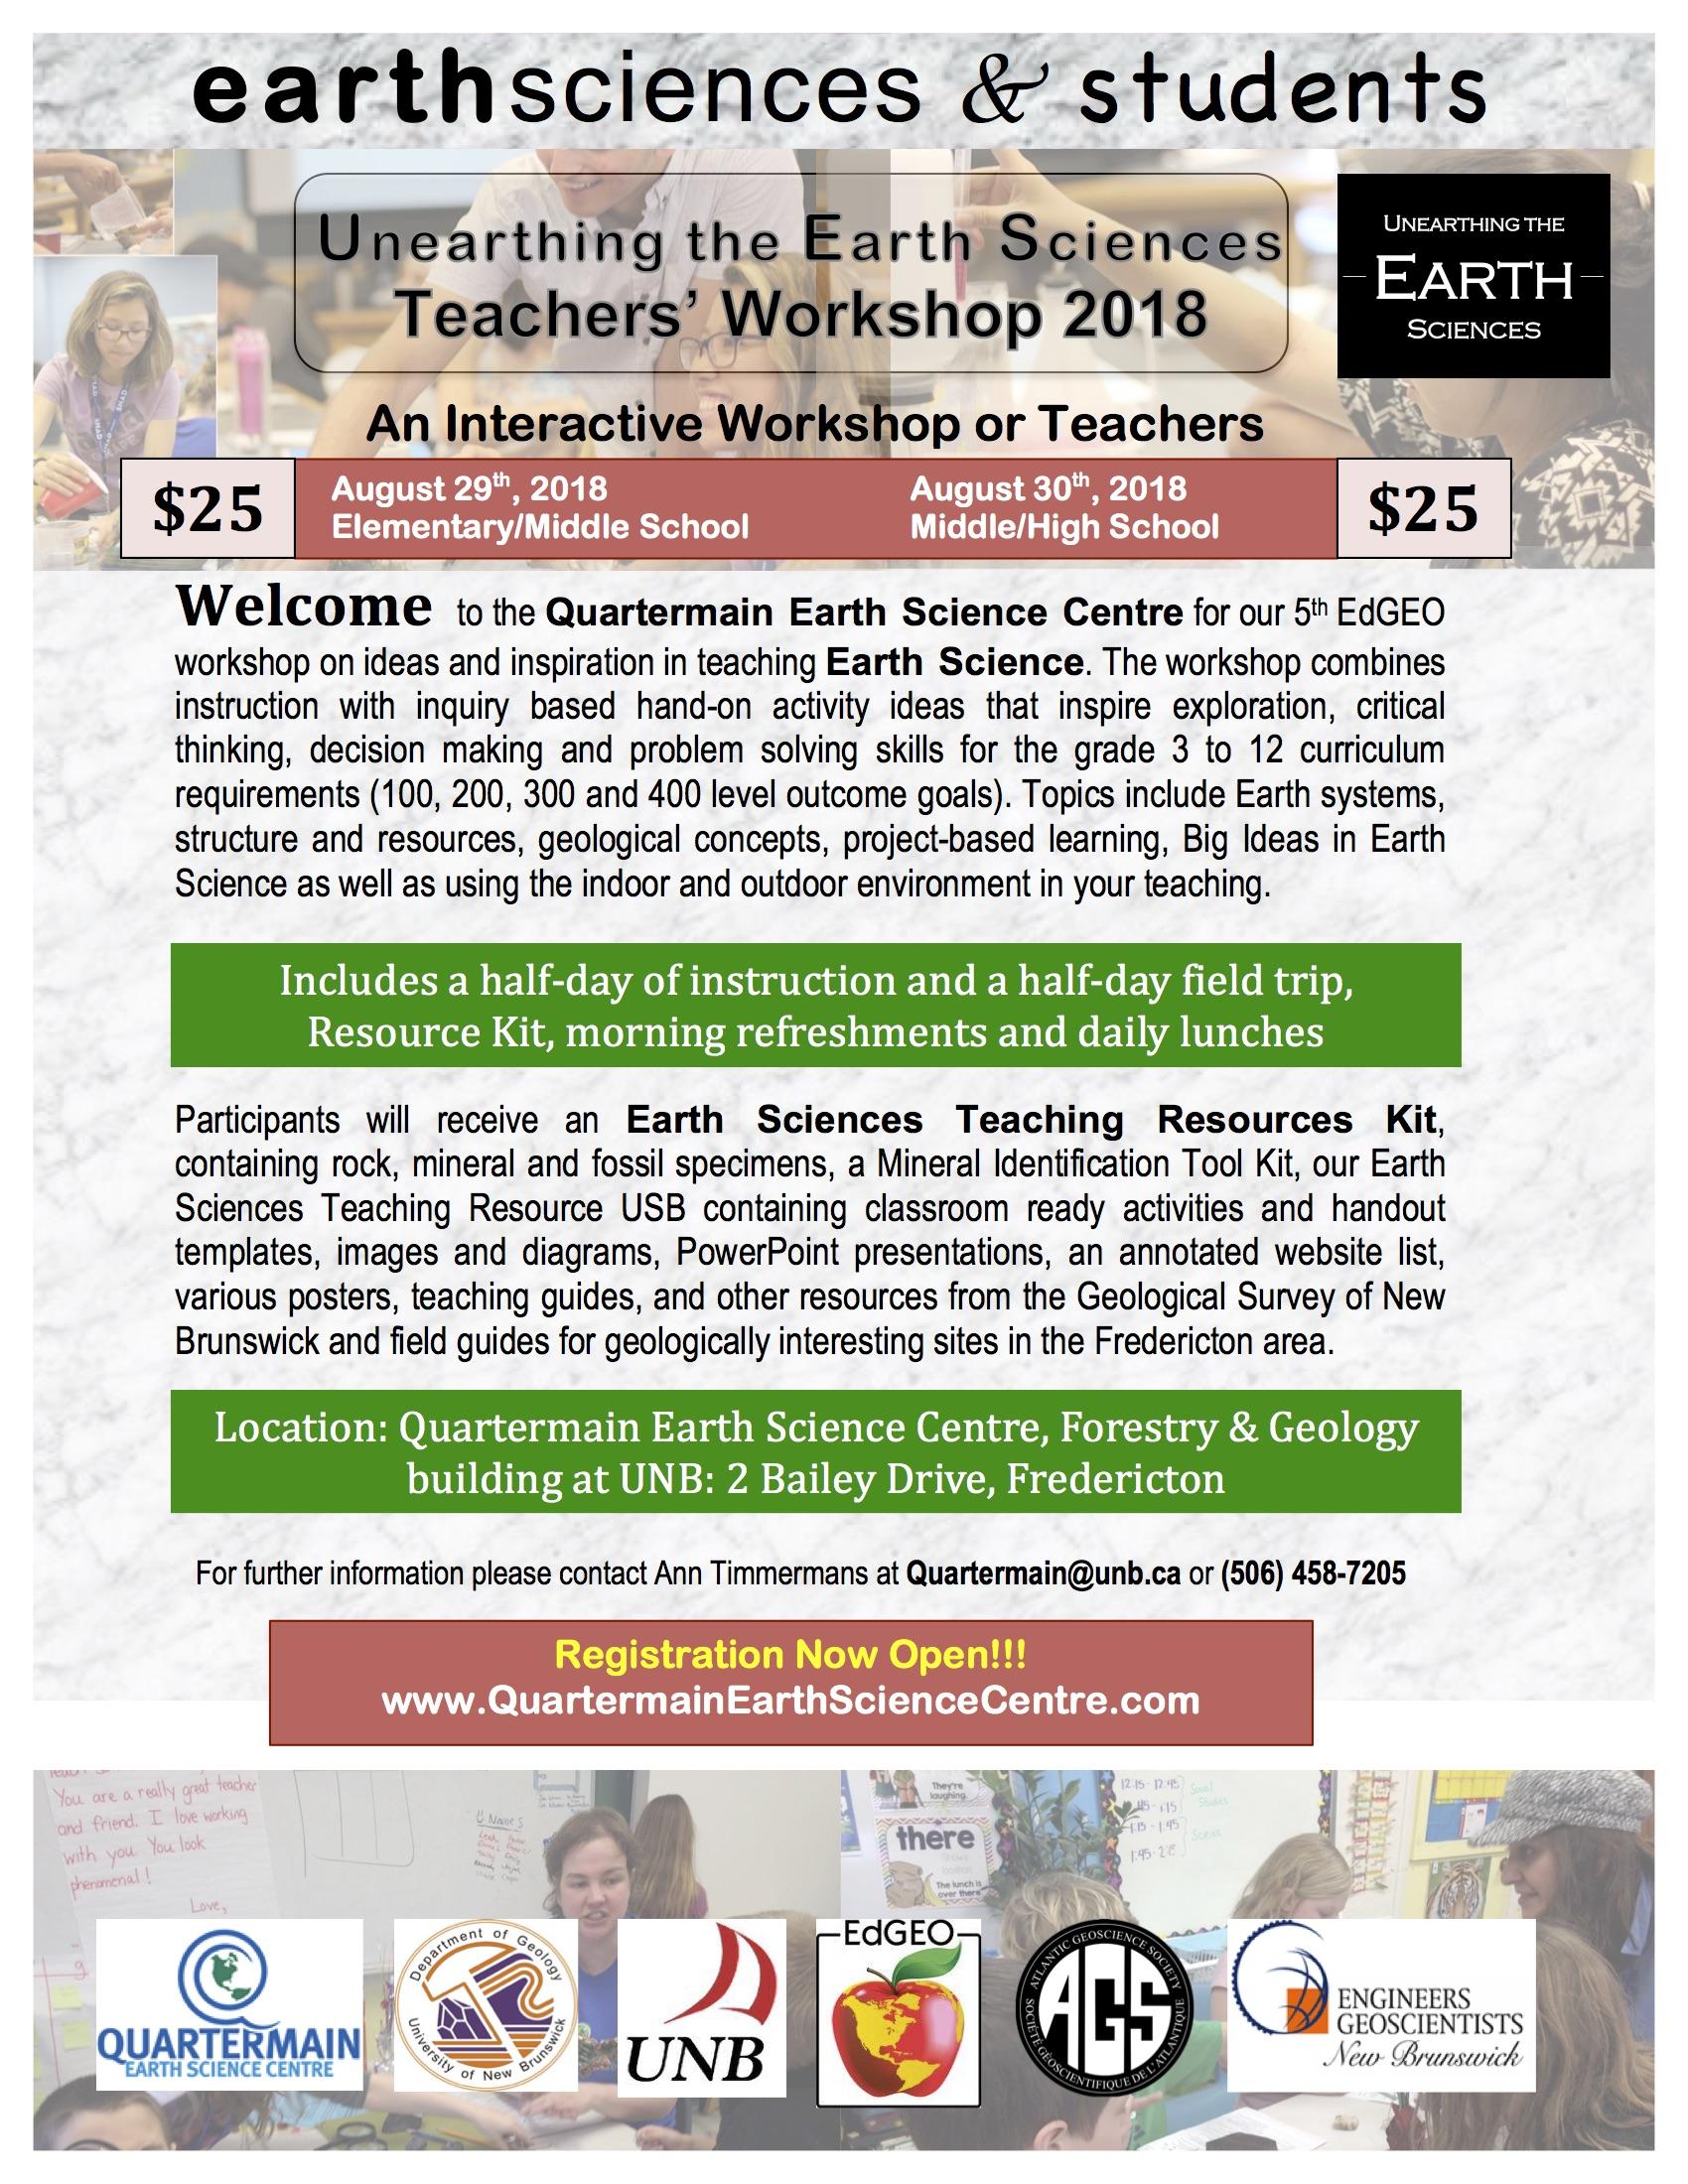 Teachers Workshop 2018 Registration Brochure page 1of3.jpg